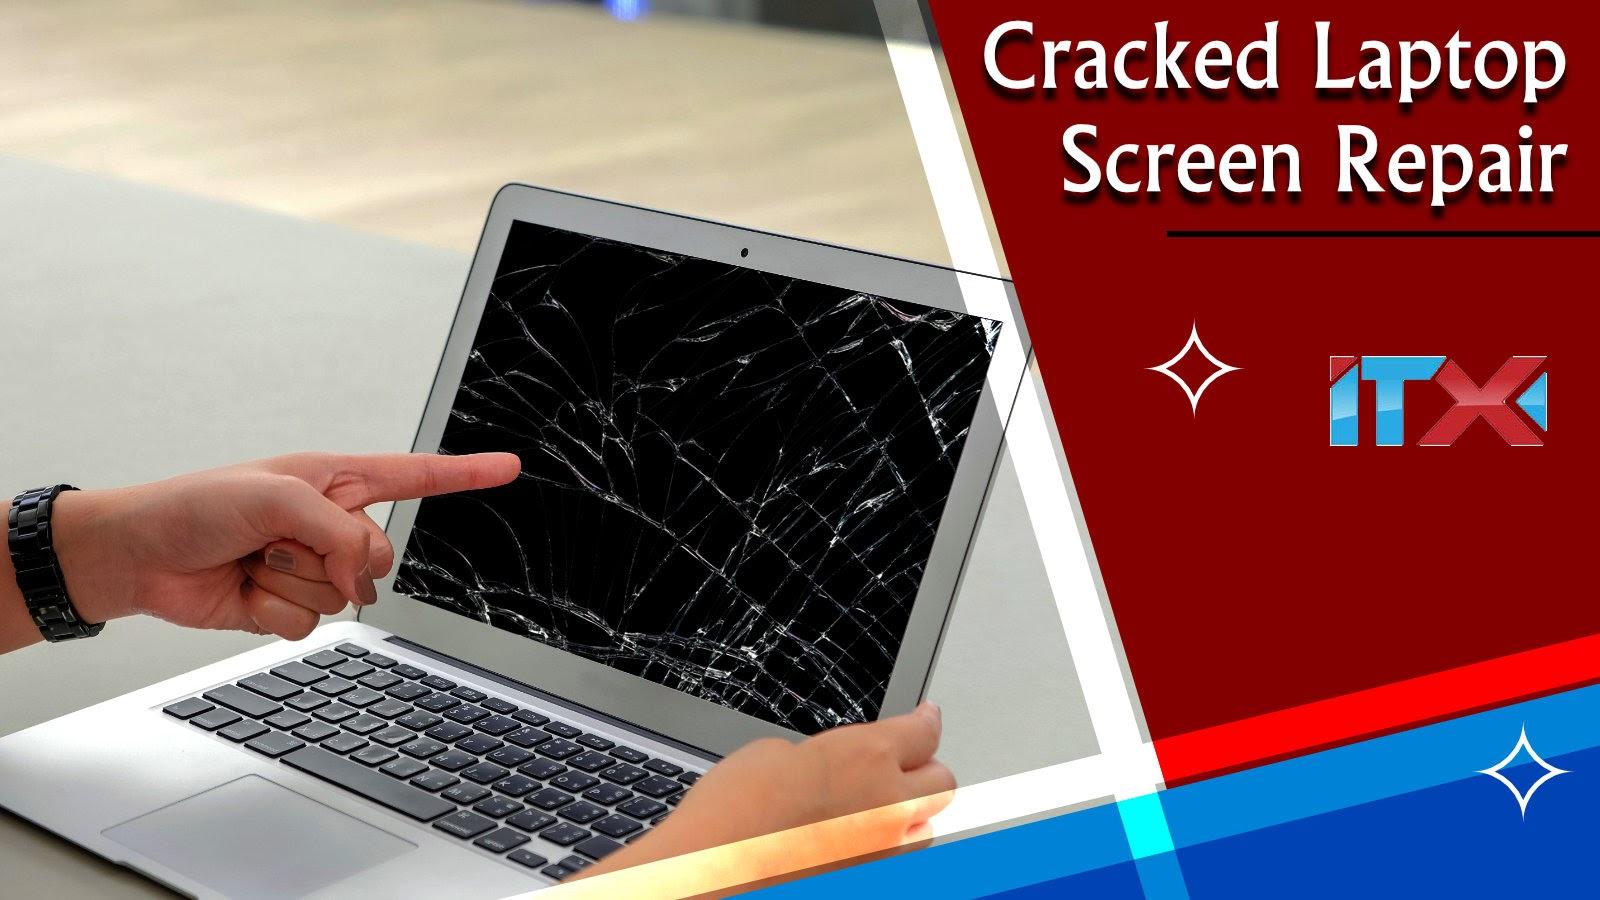 Cracked Laptop Screen Repair Cost